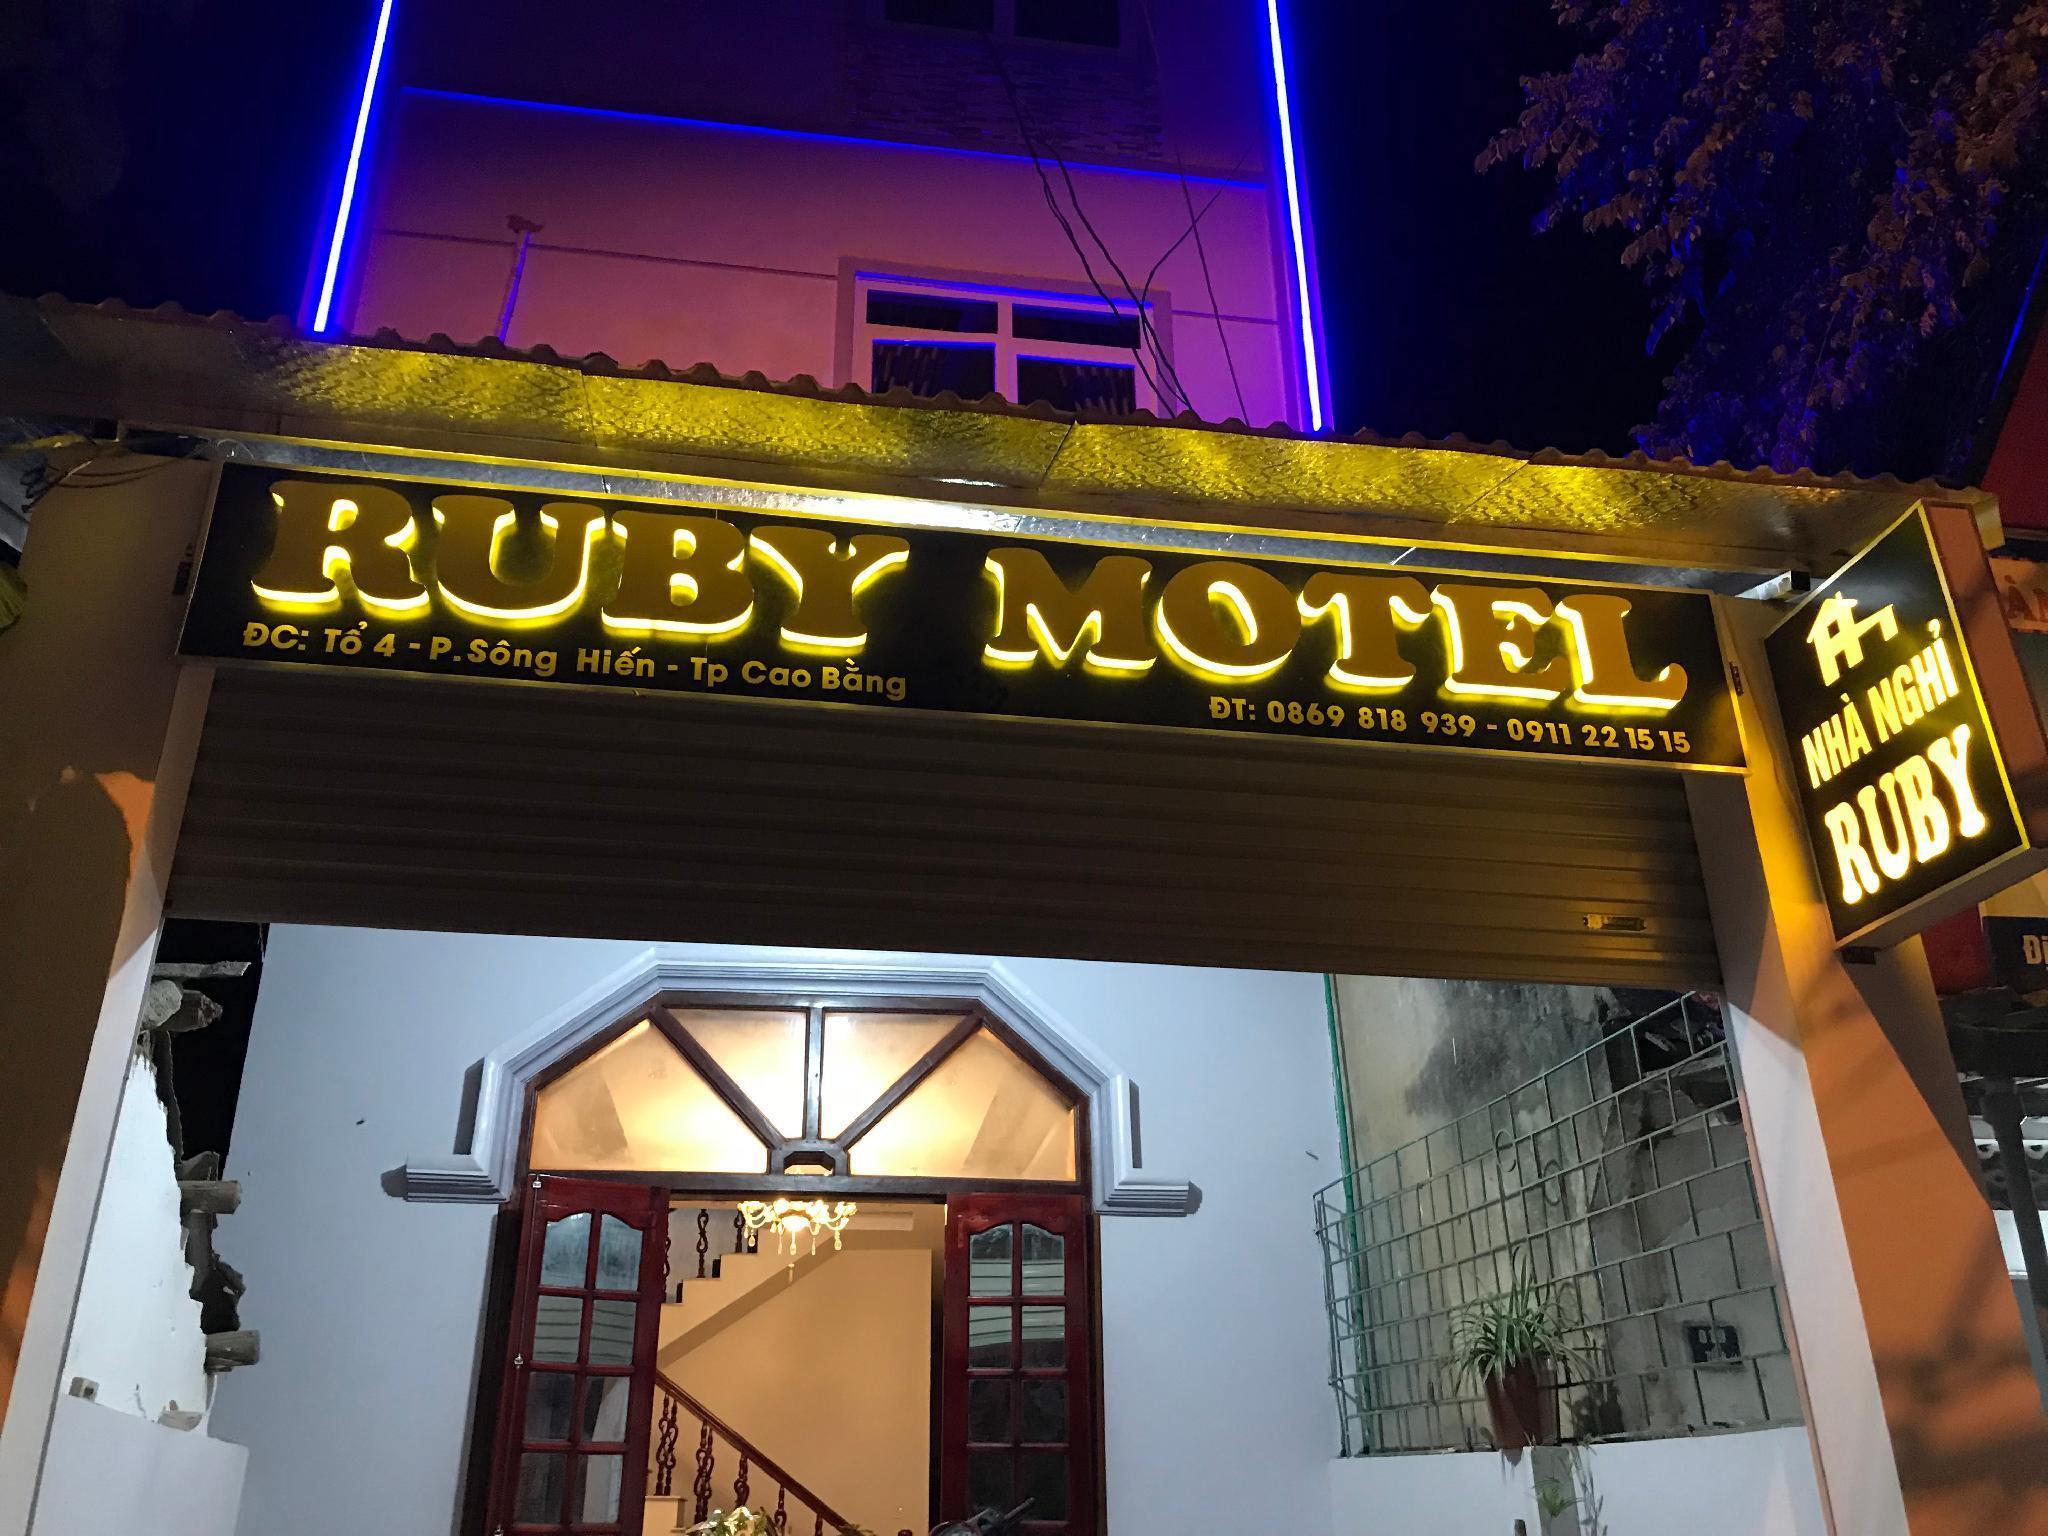 RuBy Motel, Cao Bằng